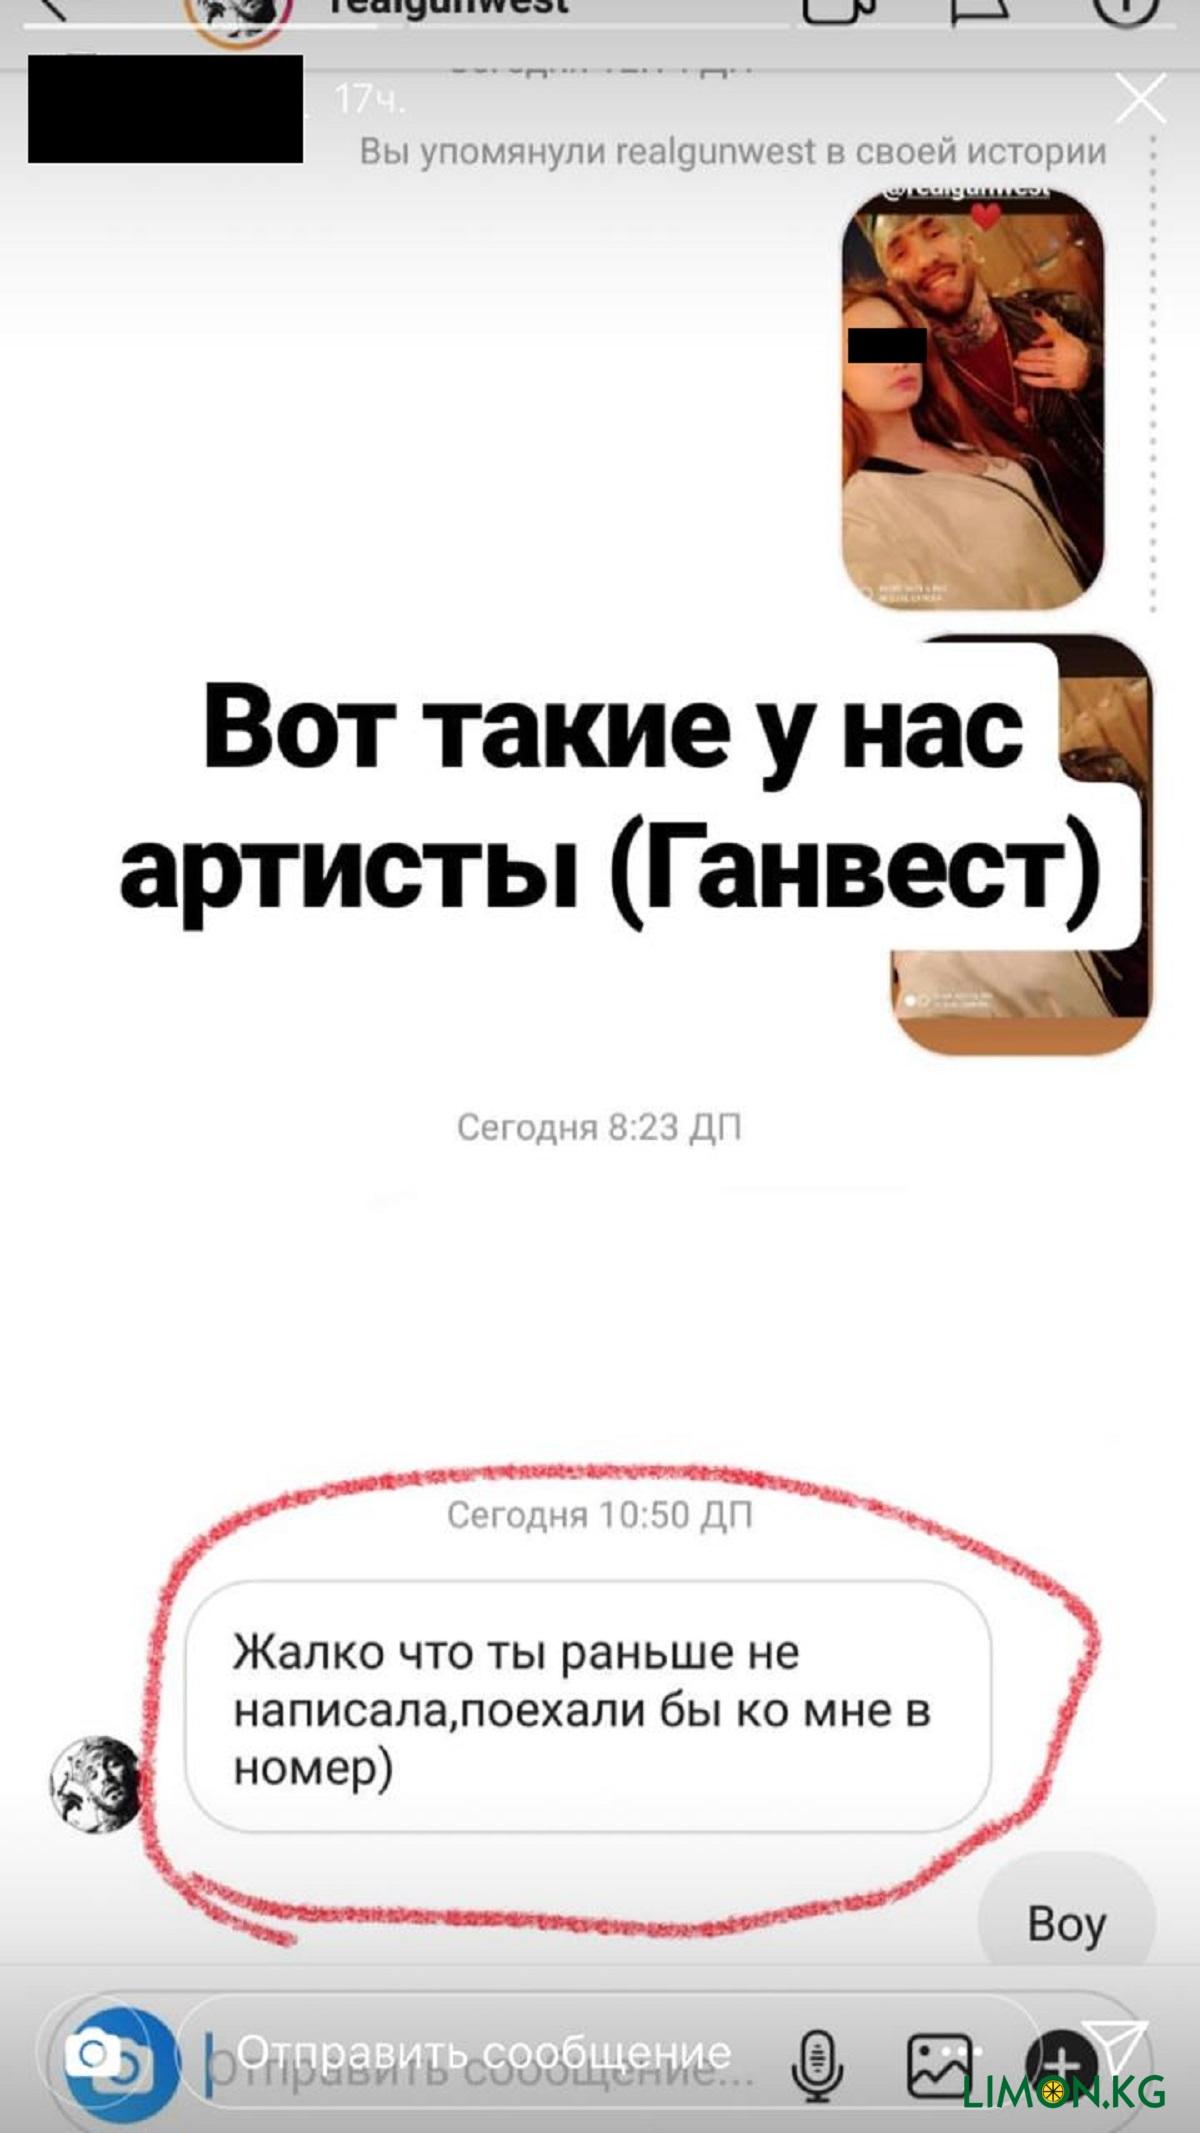 Ганвест Слив С Фанаткой Телеграмм